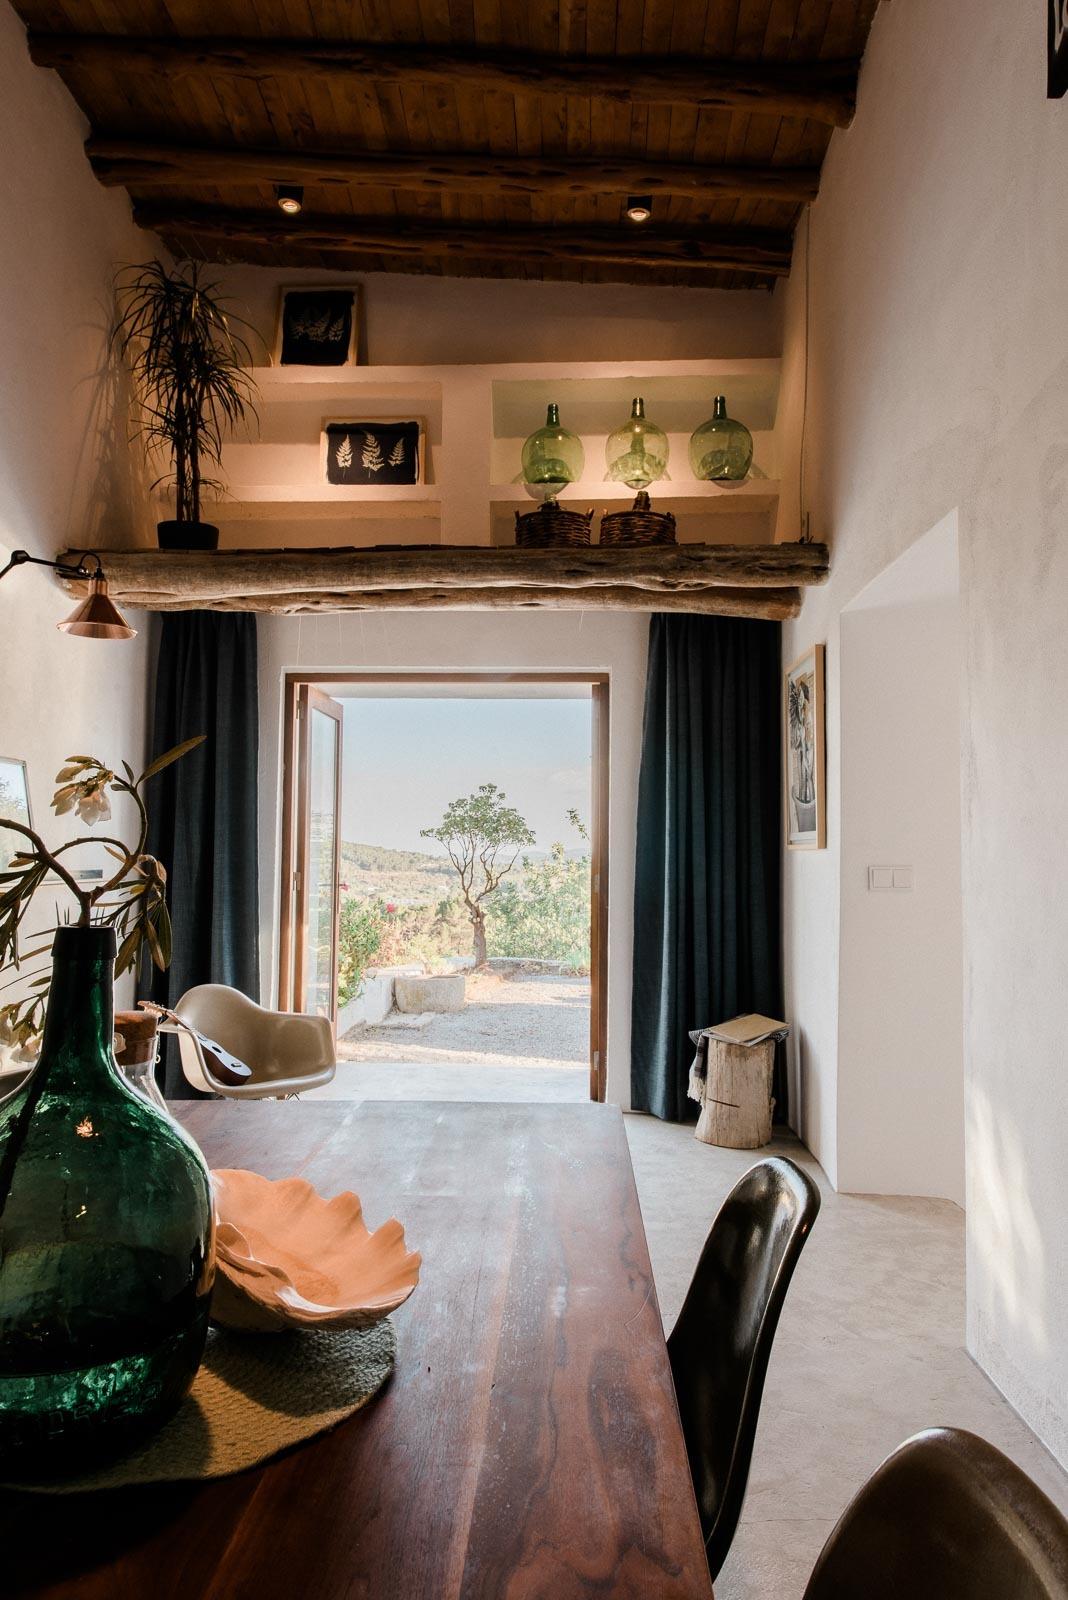 Una piccola casa di campagna a ibiza for Piccola casa di campagna francese